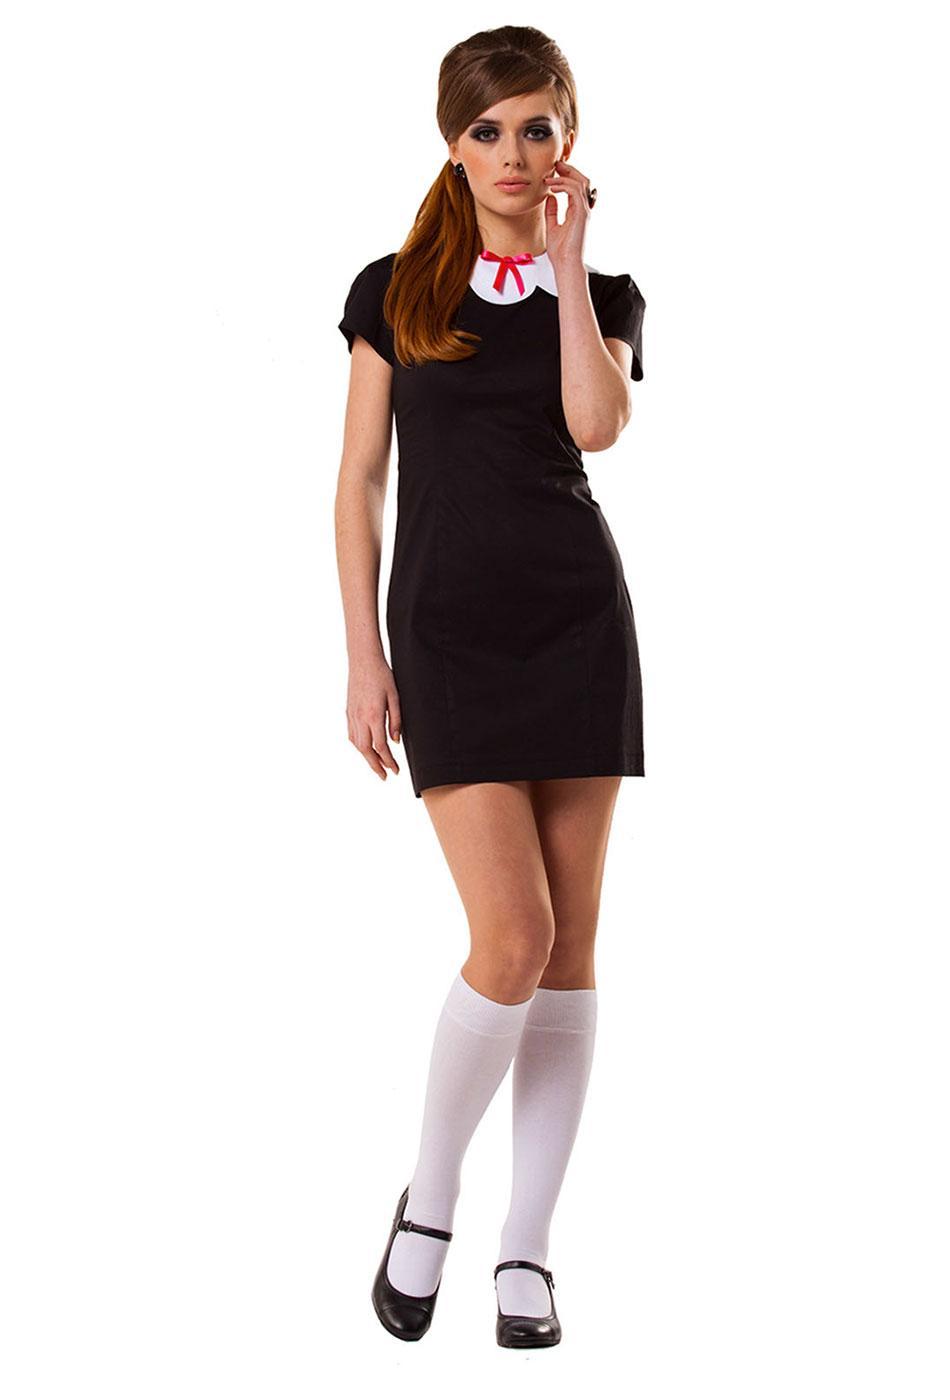 MARMALADE 60s Mod Fitted Scallop Collar Dress B/W